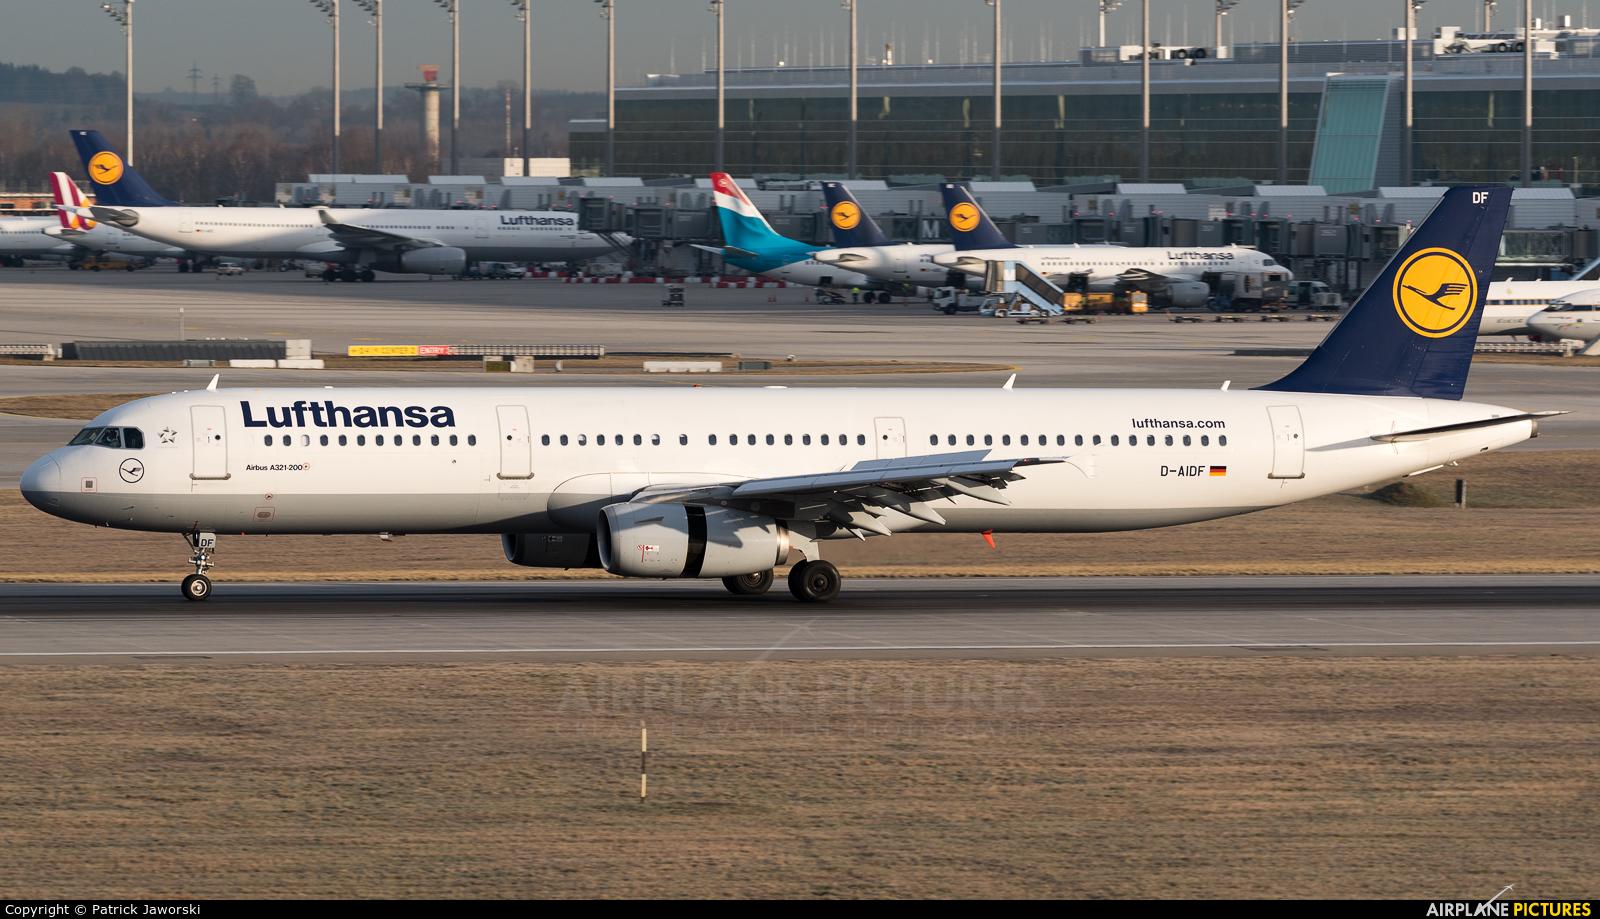 Lufthansa D-AIDF aircraft at Munich